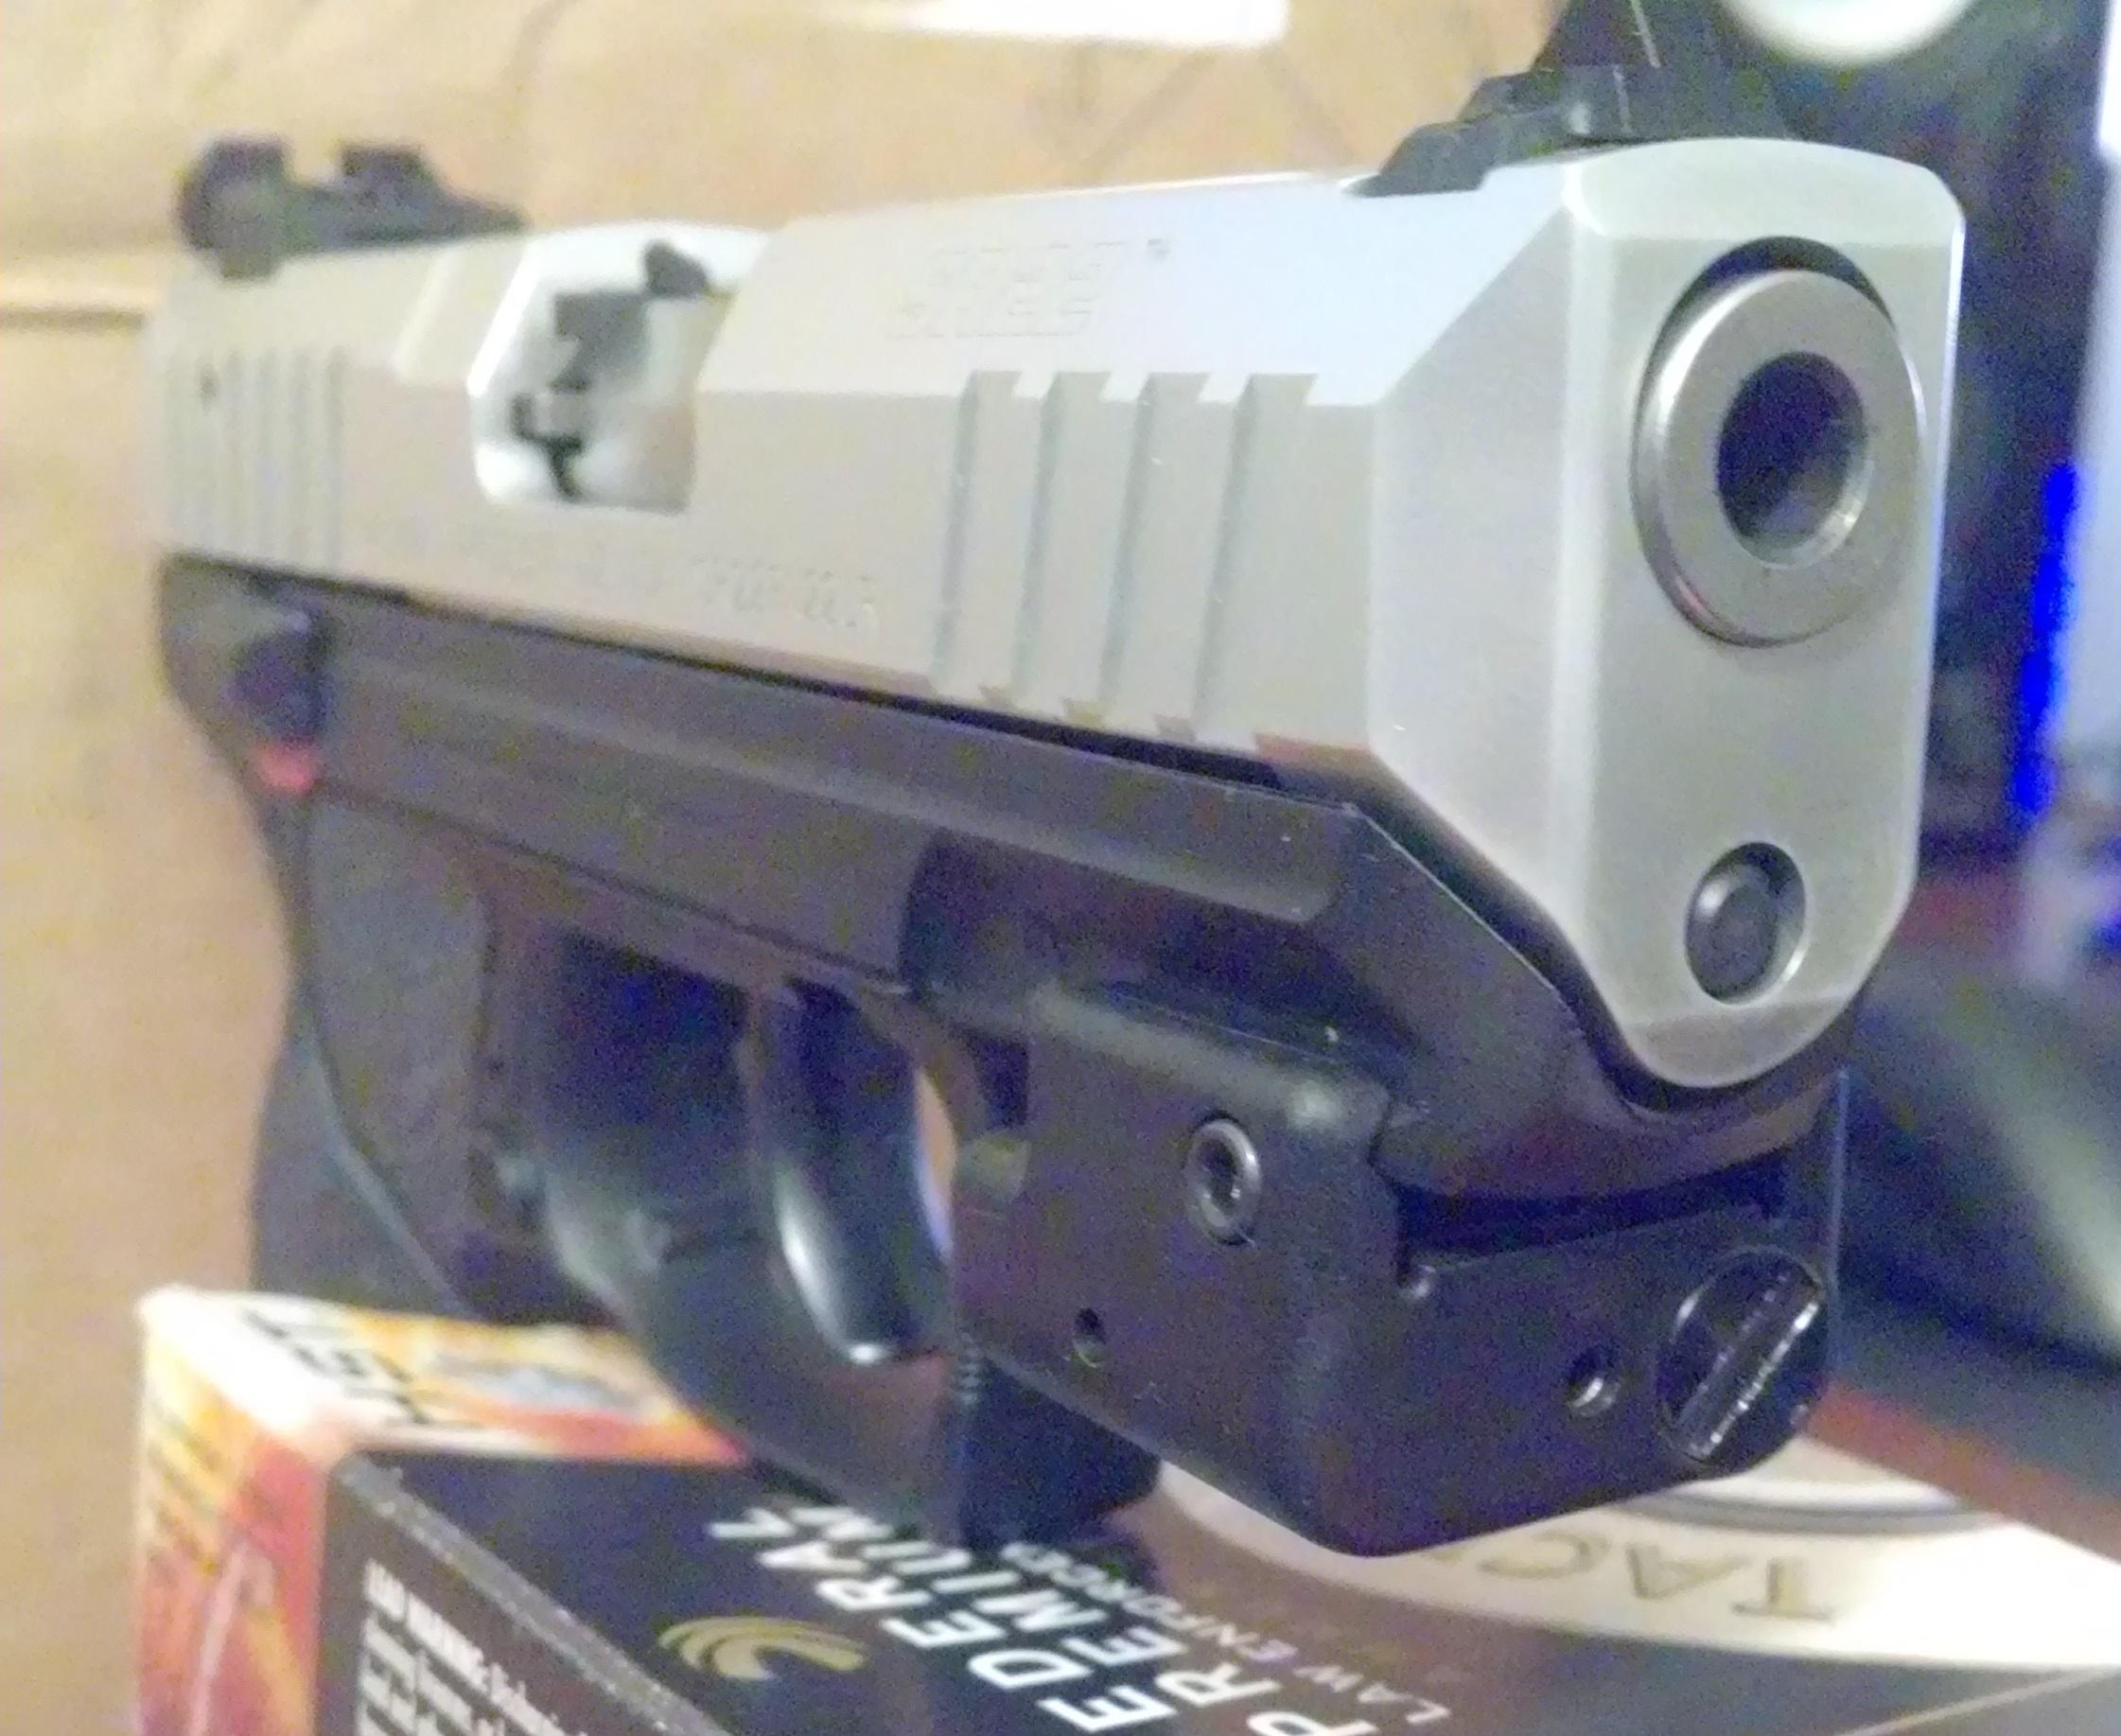 Laserlyte V4 For My SR-22-laserlyte3a.jpg